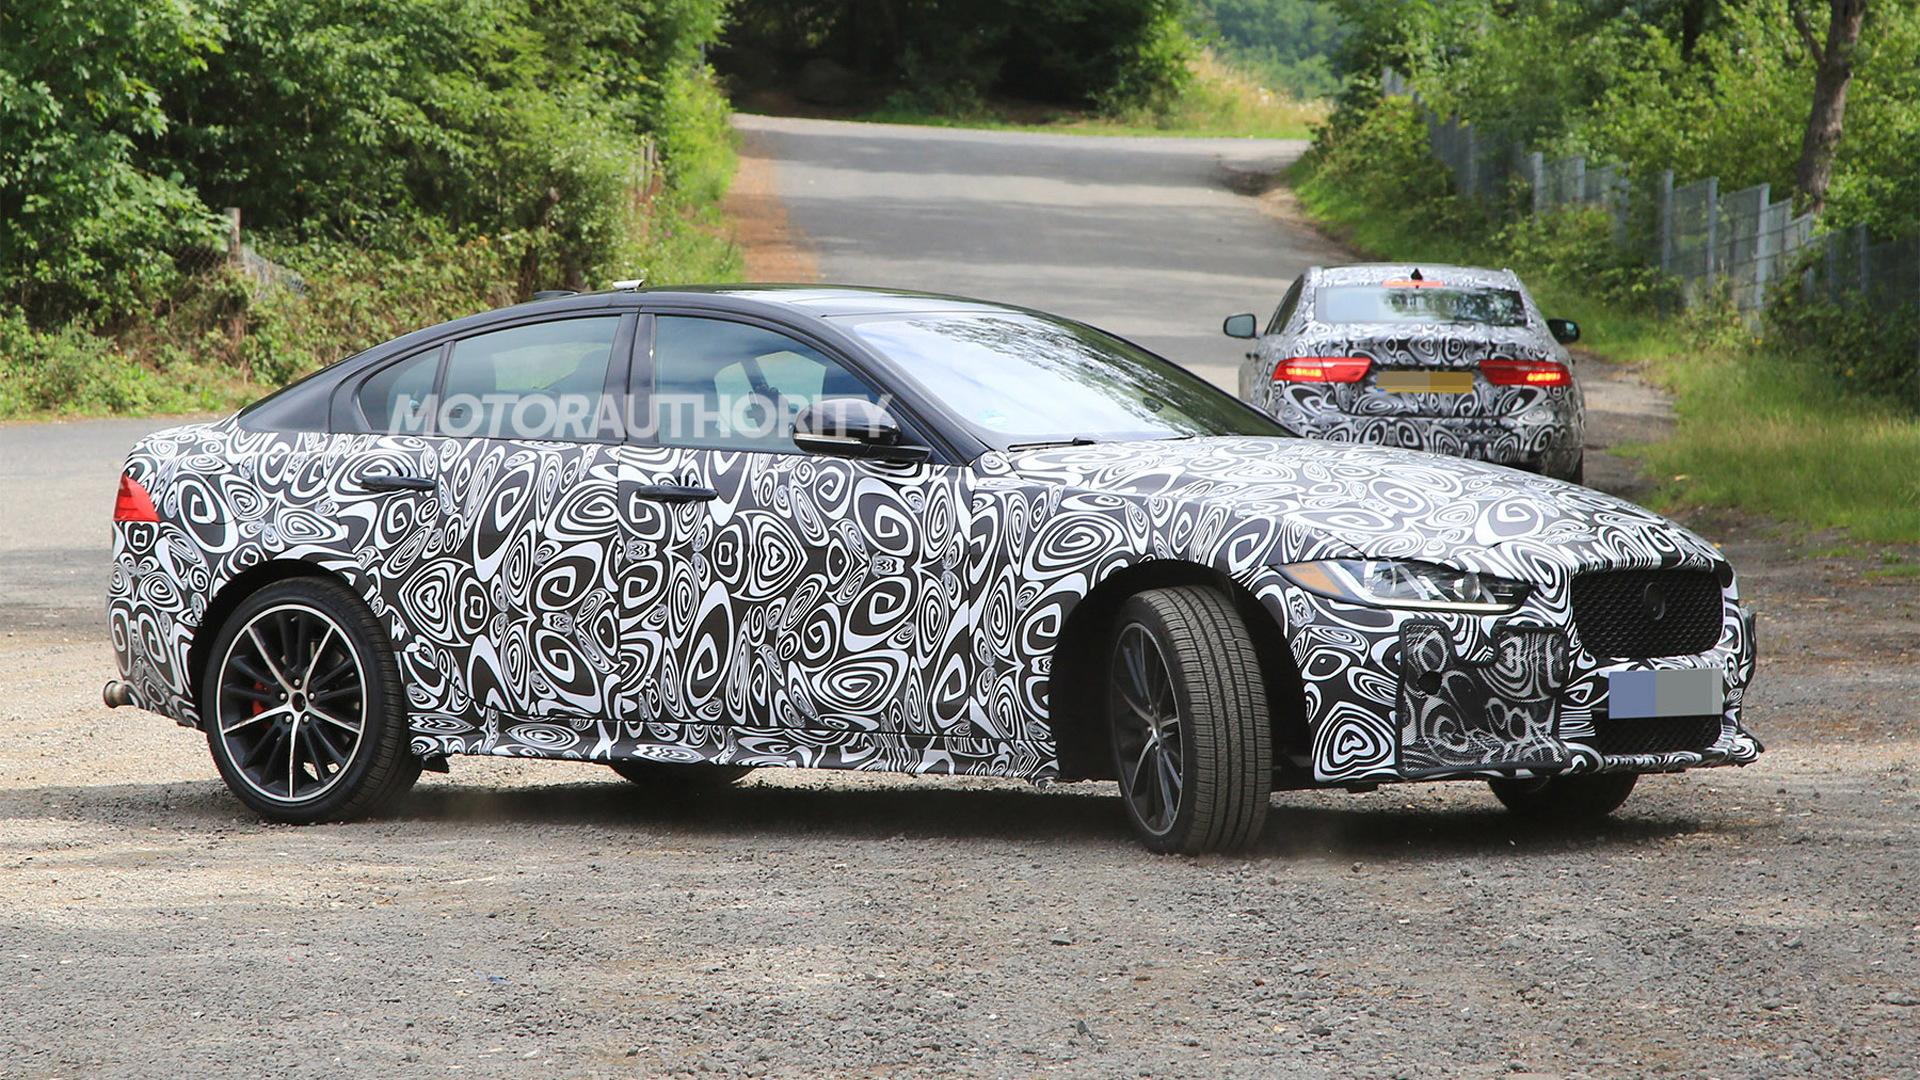 2019 Jaguar XE SVR spy shots - Image via S. Baldauf/SB-Medien